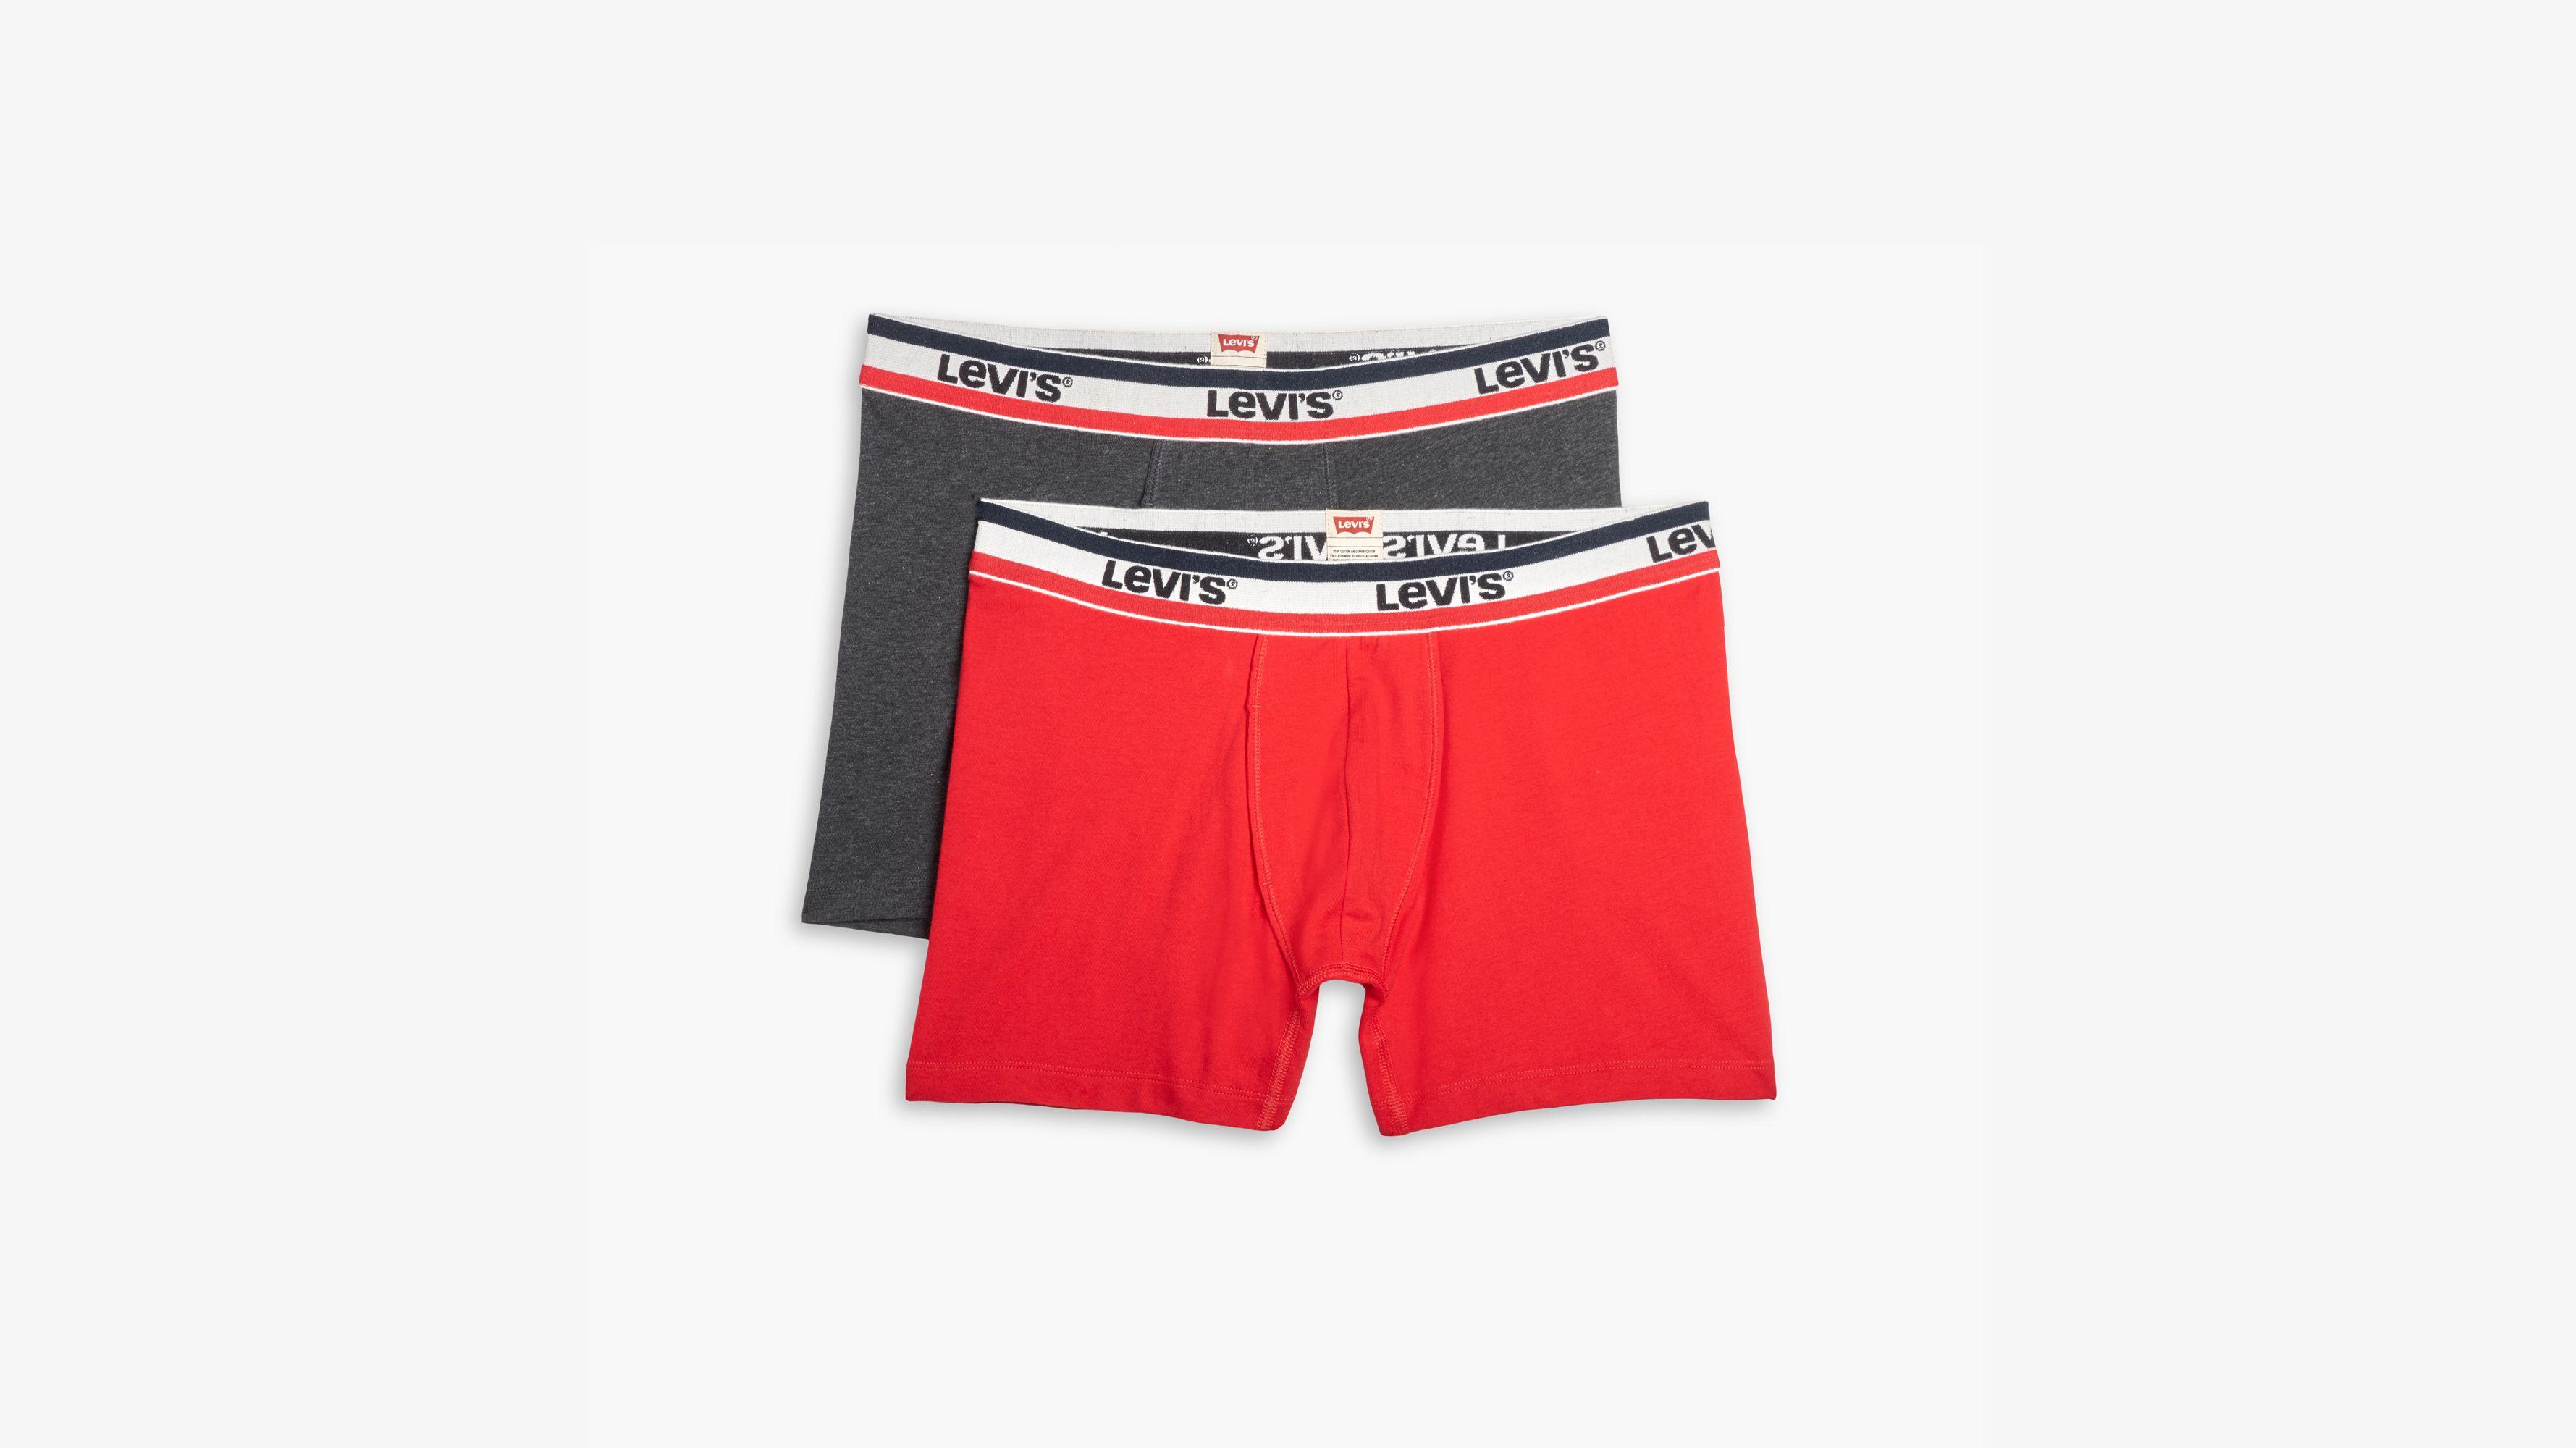 Mens 2-Pack Boxer Briefs Polyester Underwear Trunk Underwear with Aloha Friday Design